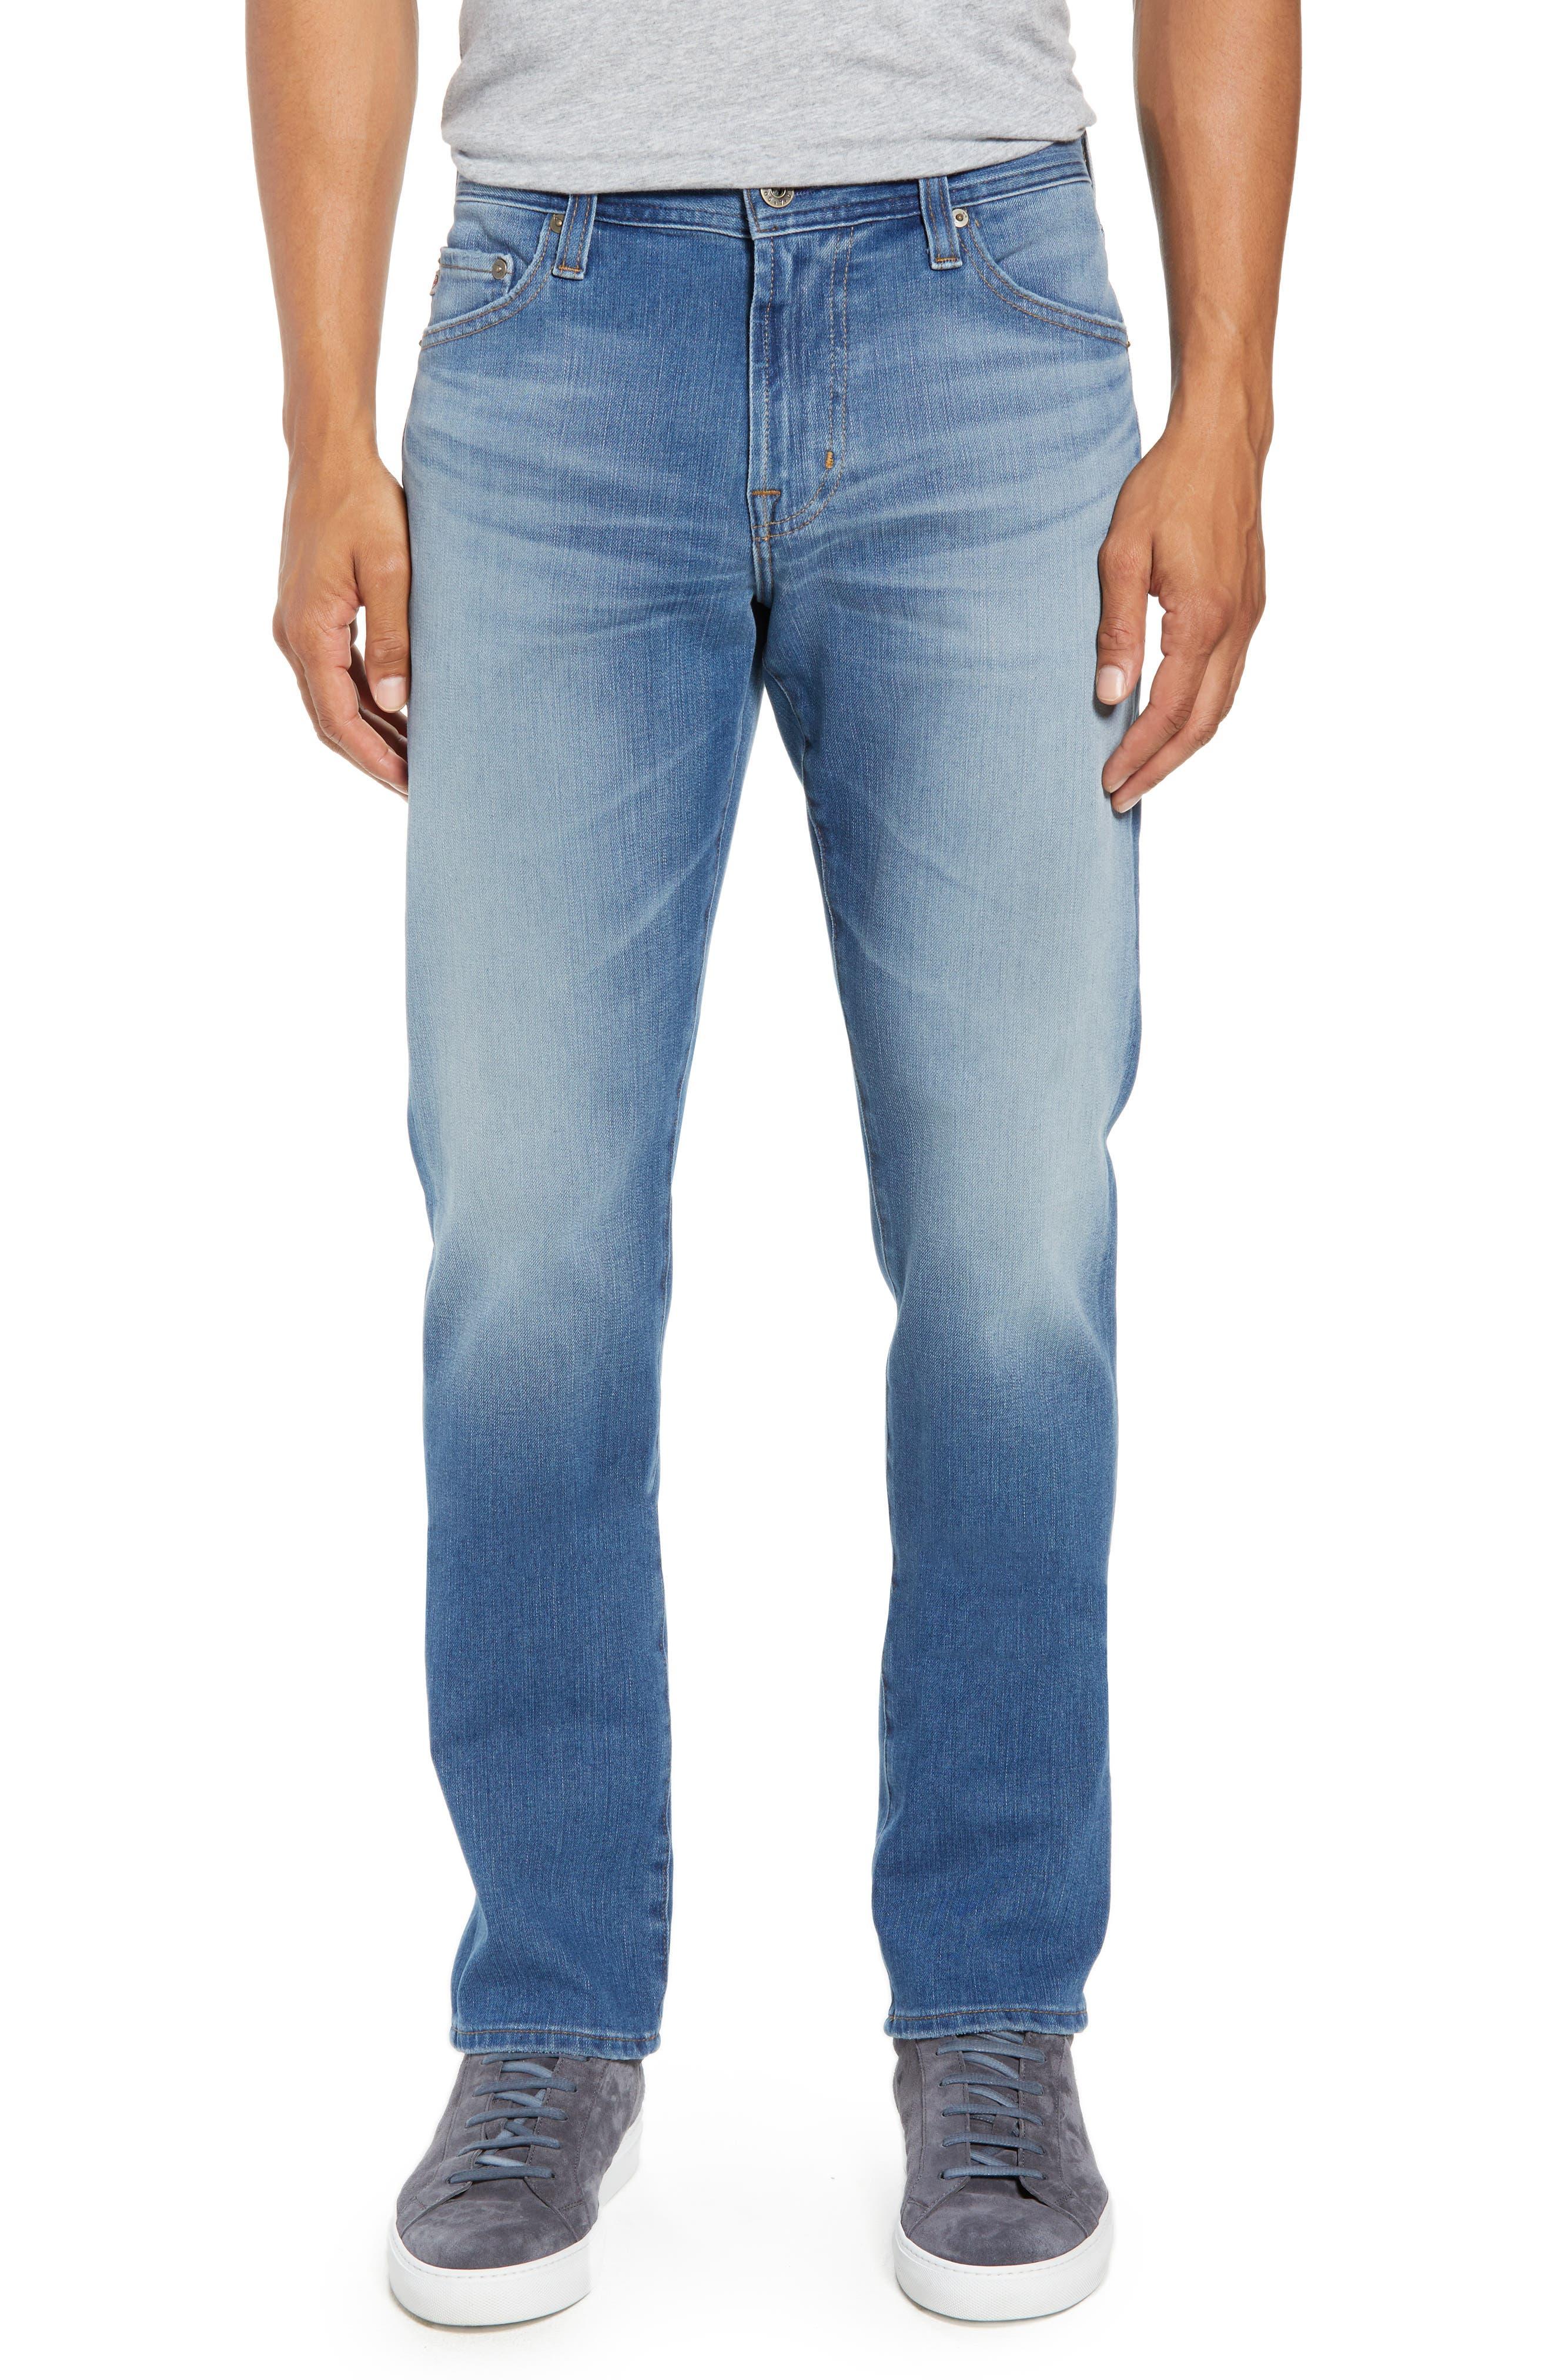 Everett Slim Straight Leg Jeans,                         Main,                         color, 487